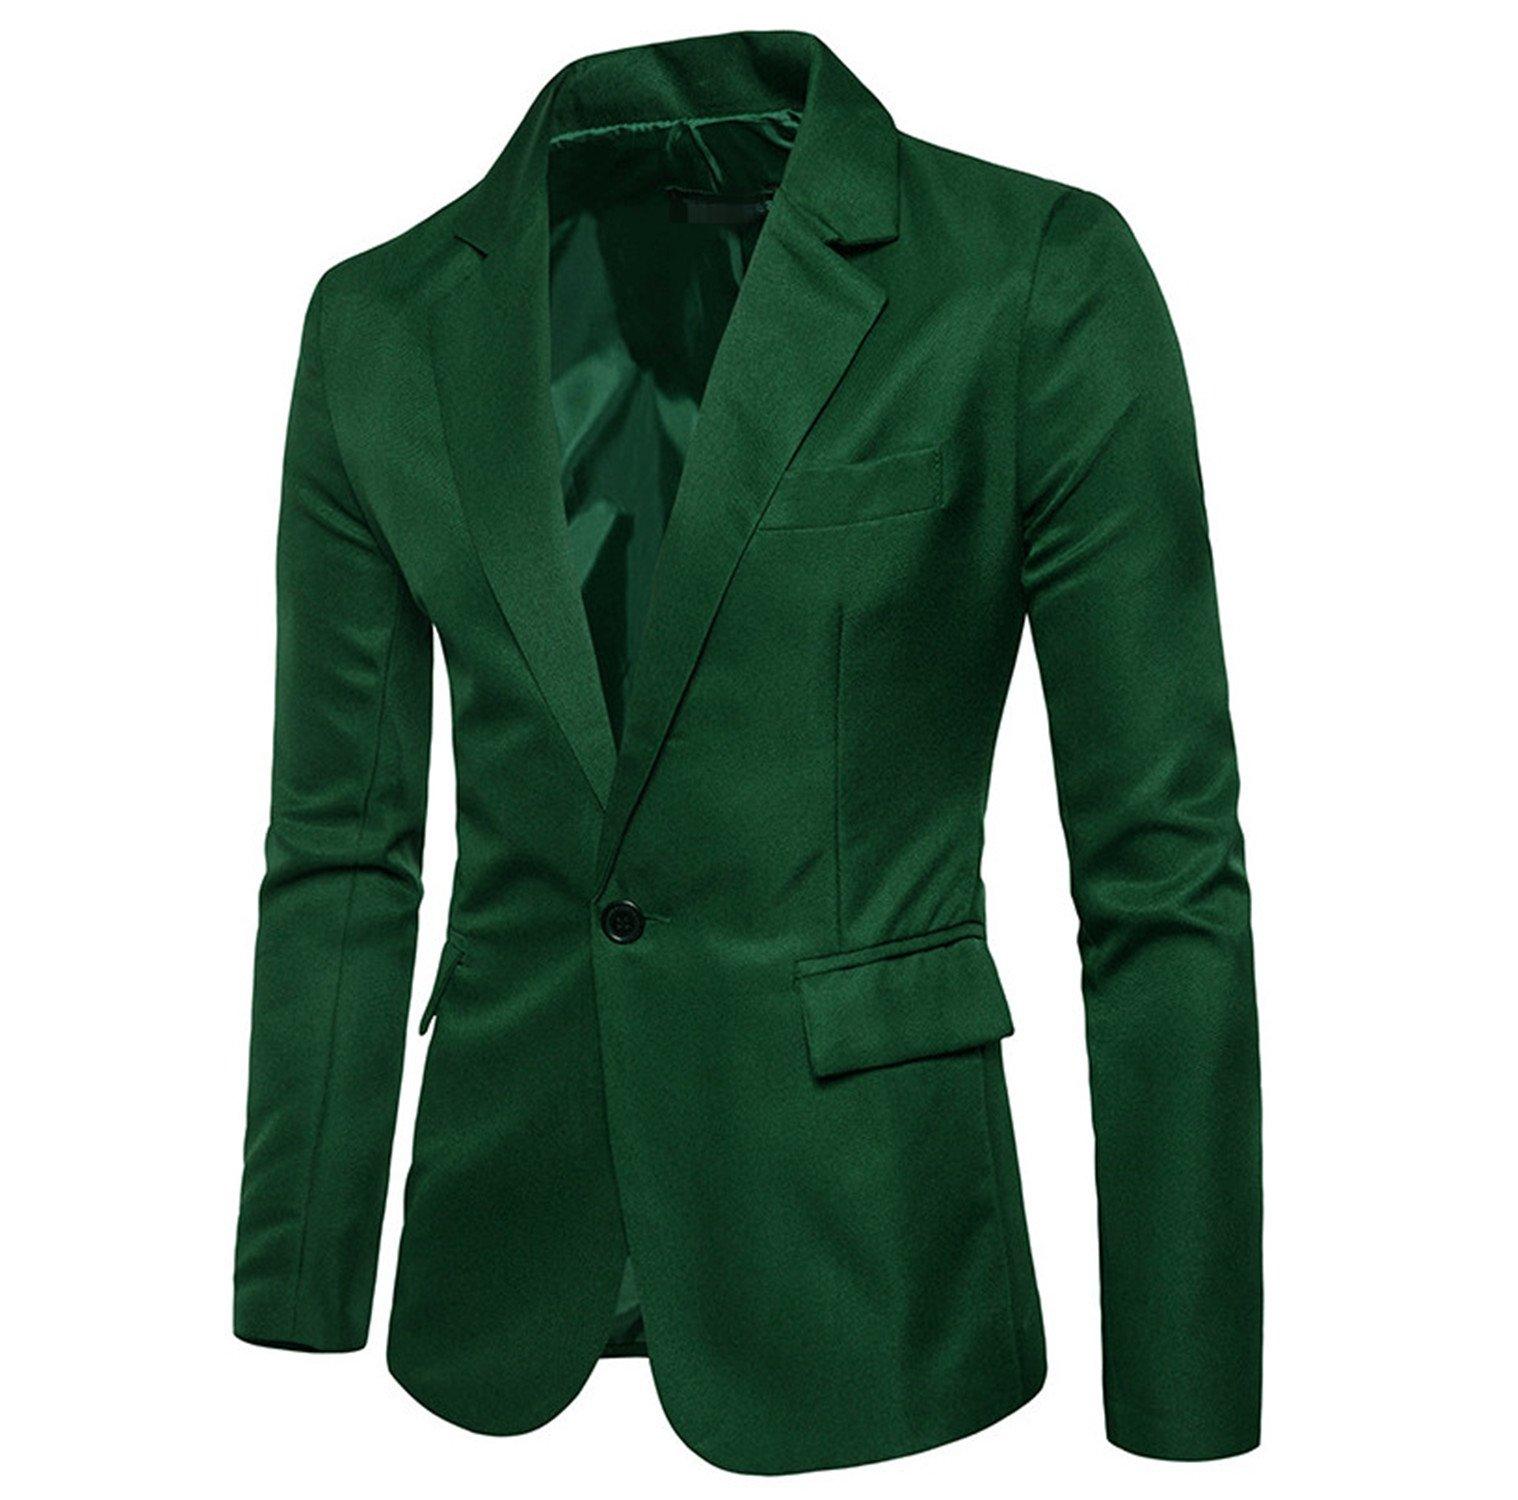 Drawingo Men Slim Fit Blazer Solid Color Business Blazer Wedding Suit Jacket Glass Green XL